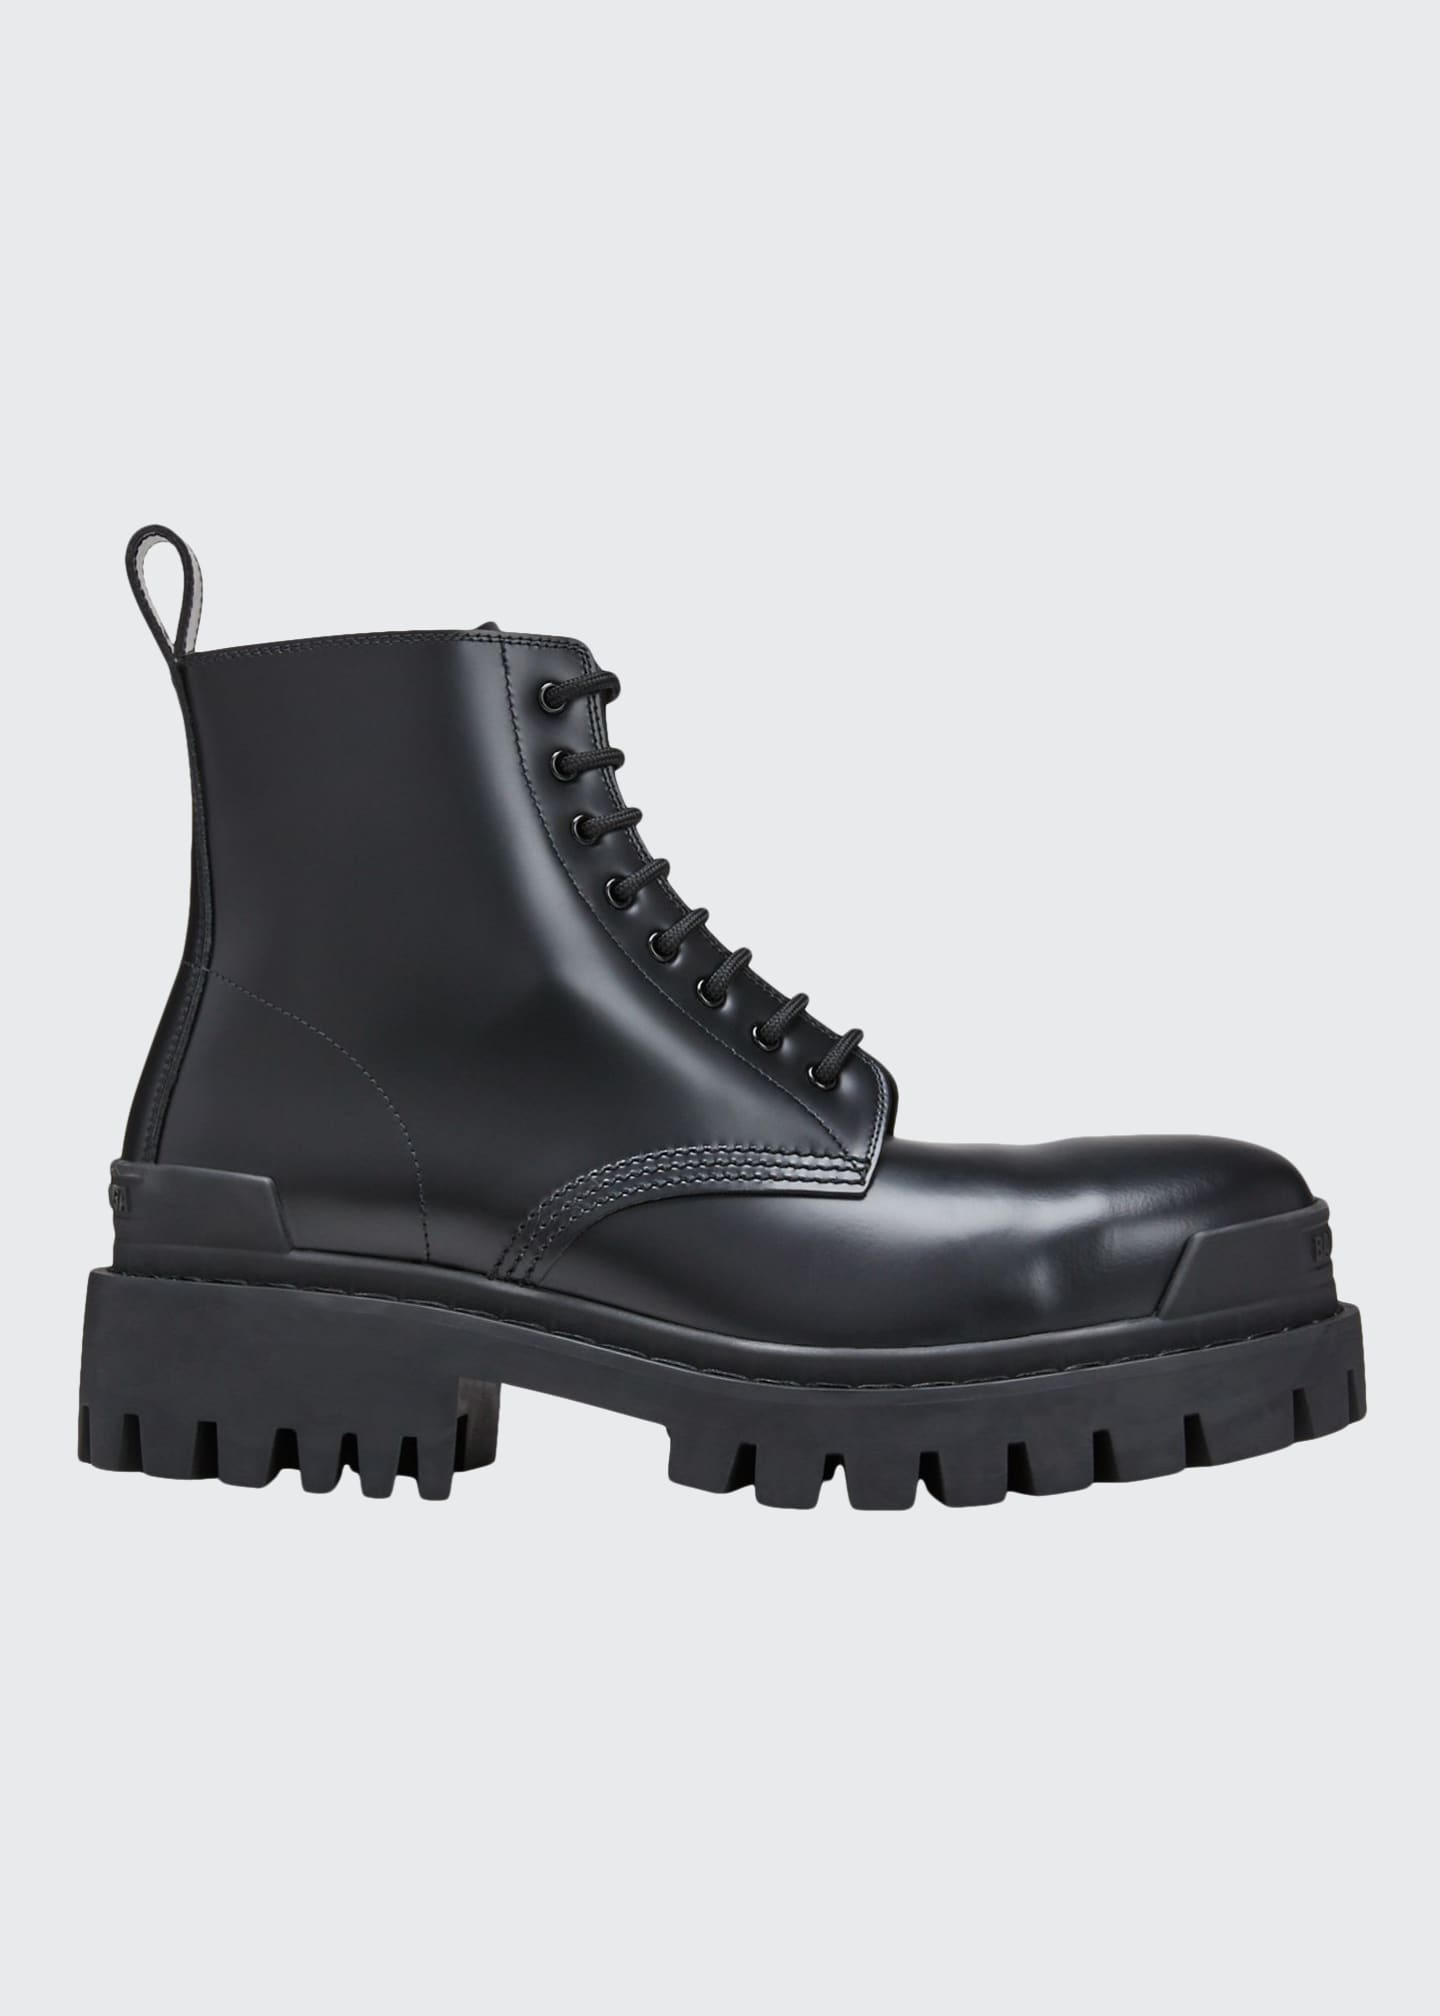 Balenciaga Men's Shrike Lug-Sole Leather Combat Boots